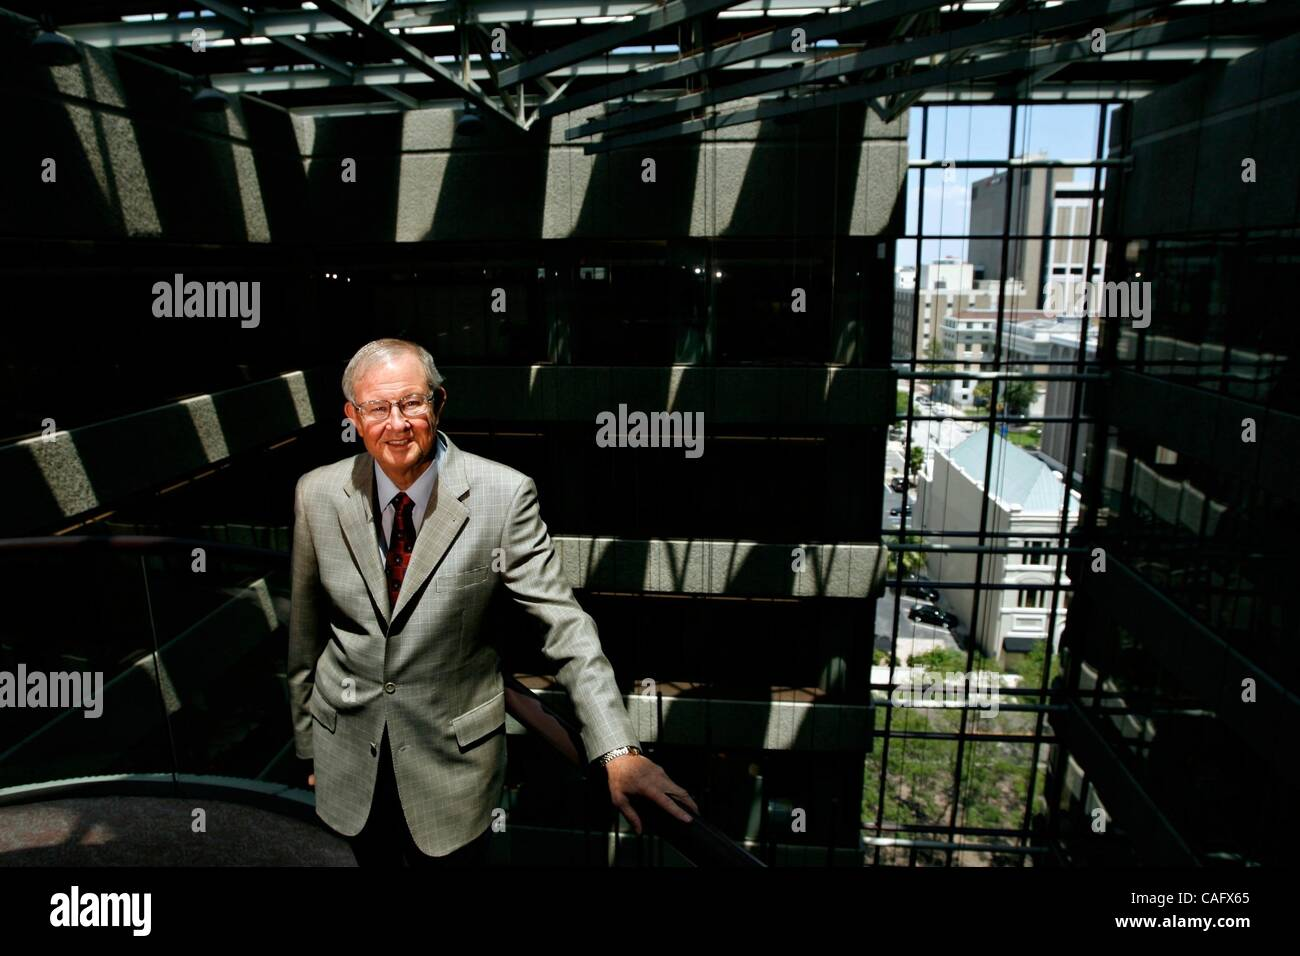 Feb 21, 2008 - Tampa, Florida, USA - TECO Energy chairman and chief executive officer Sherrill Hudson, photographed - Stock Image